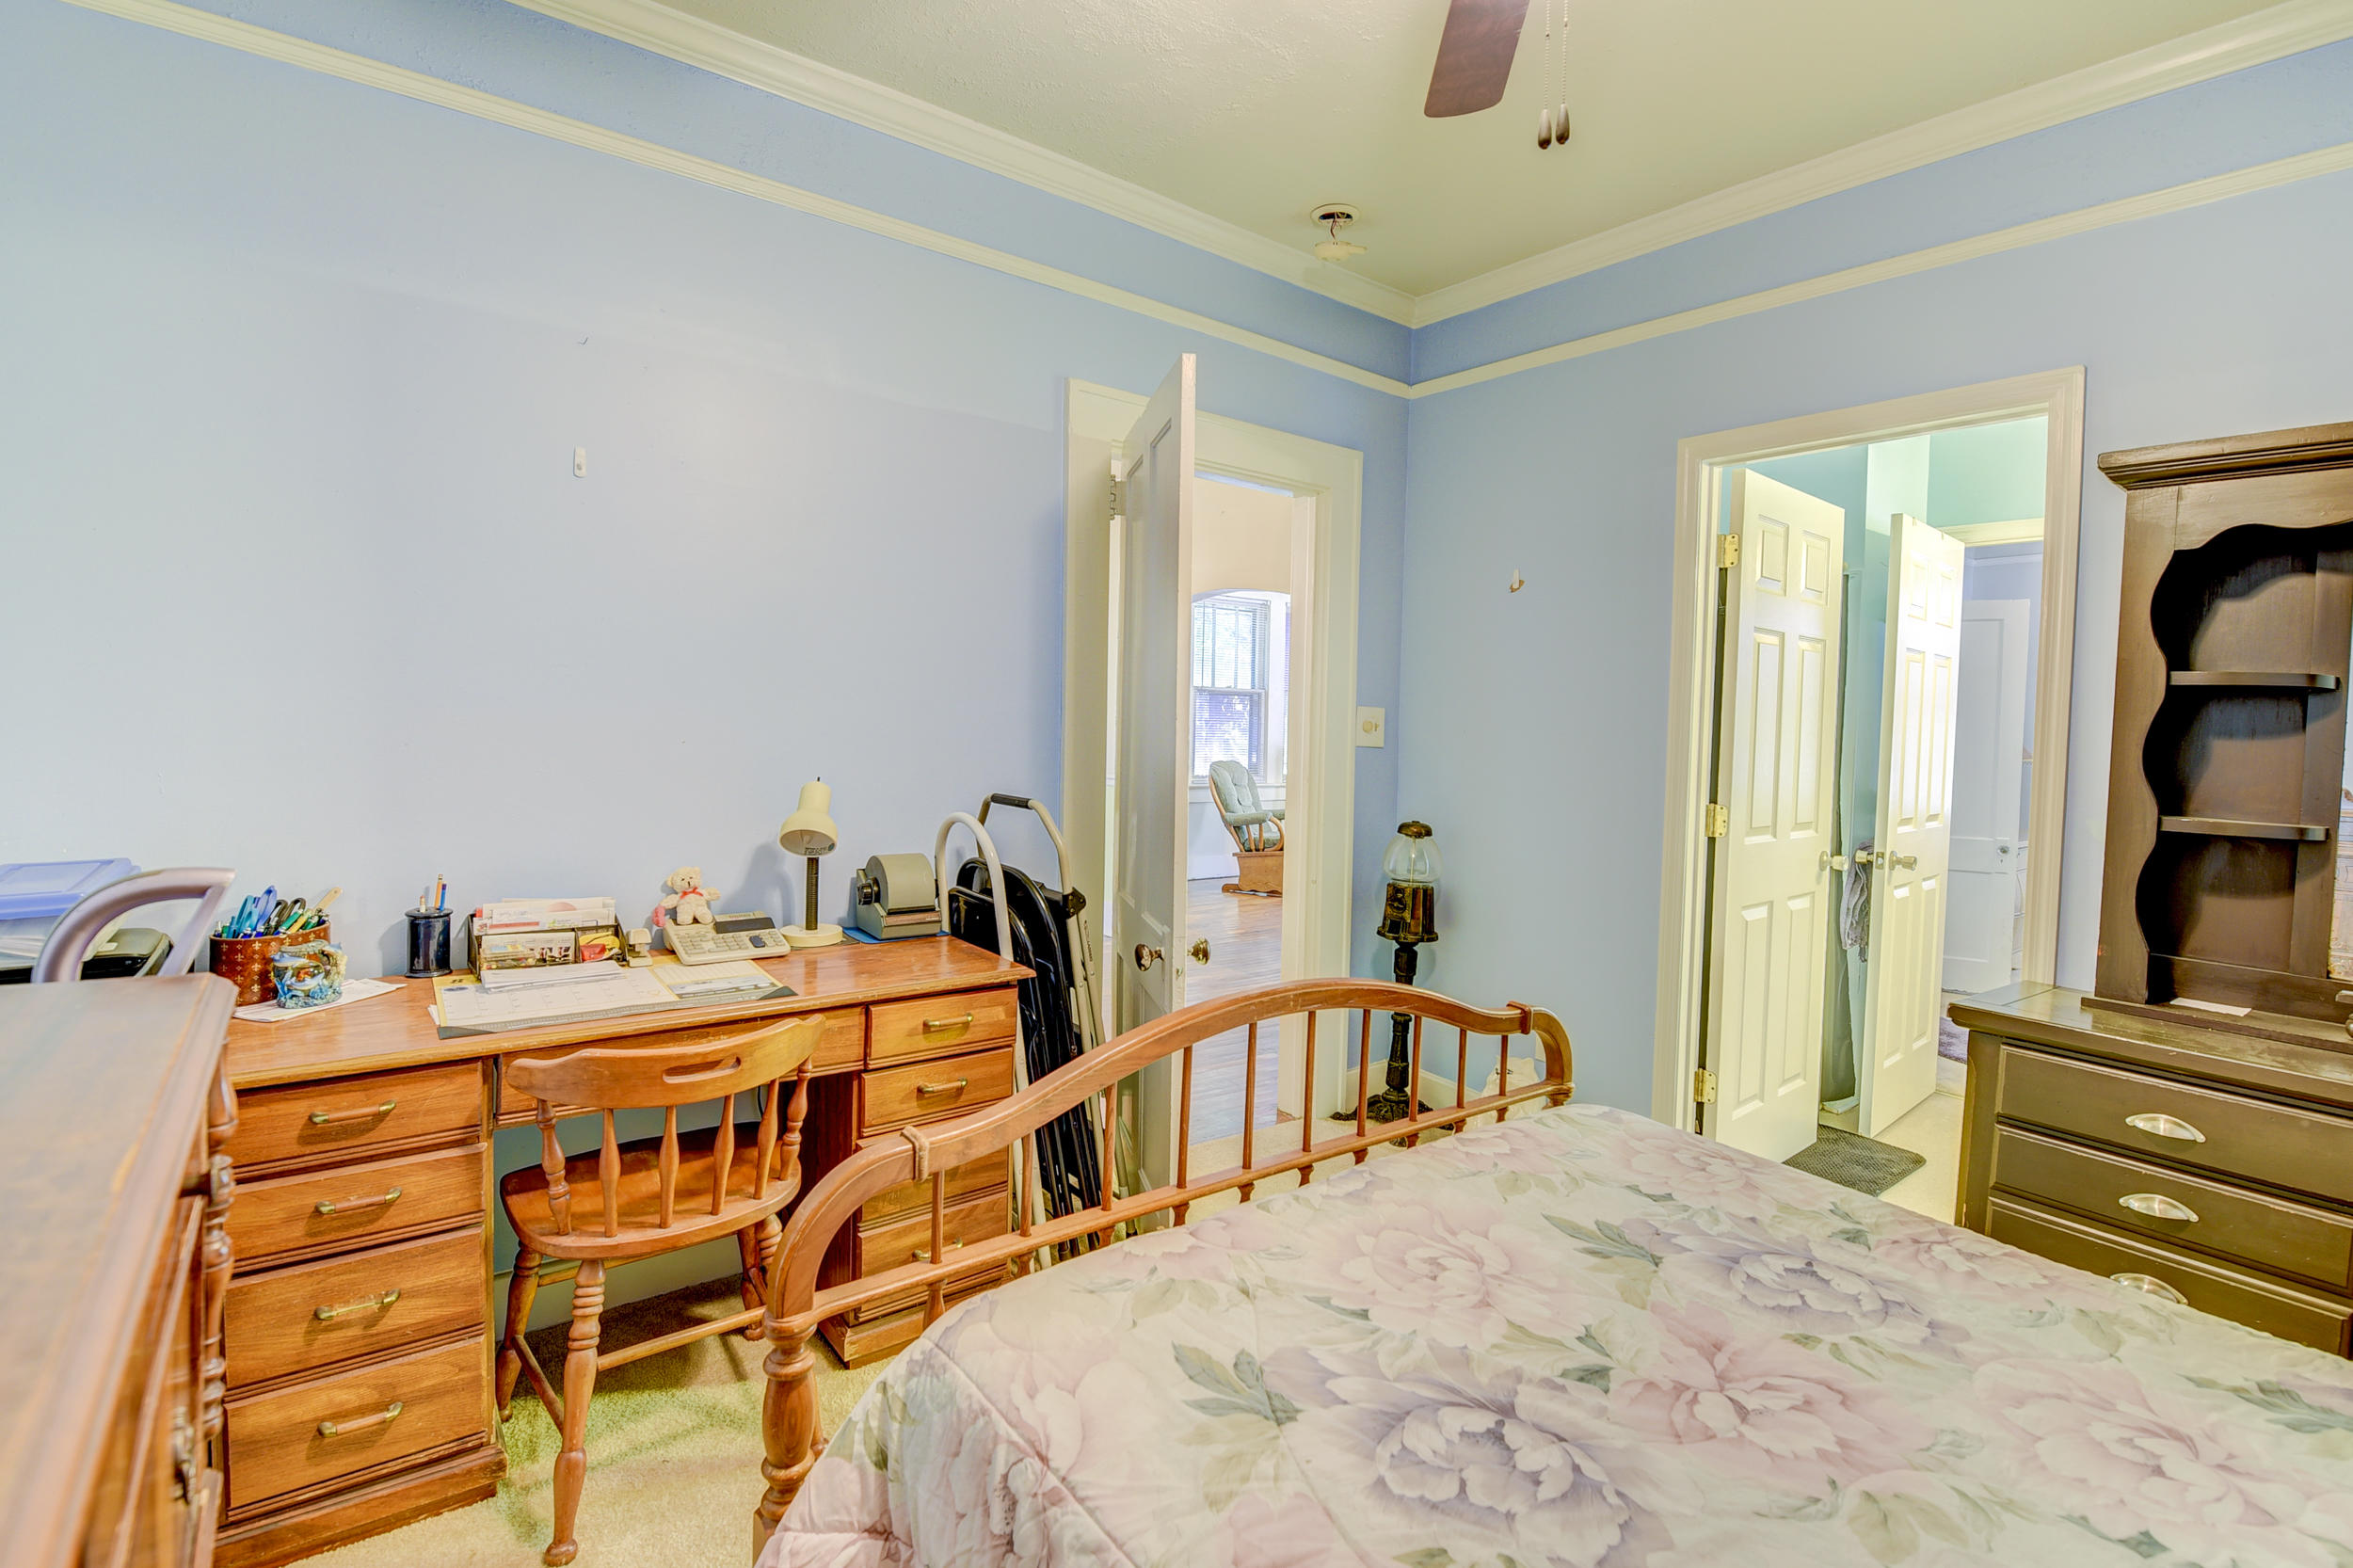 St Andrews Homes For Sale - 1908 2nd, Charleston, SC - 3